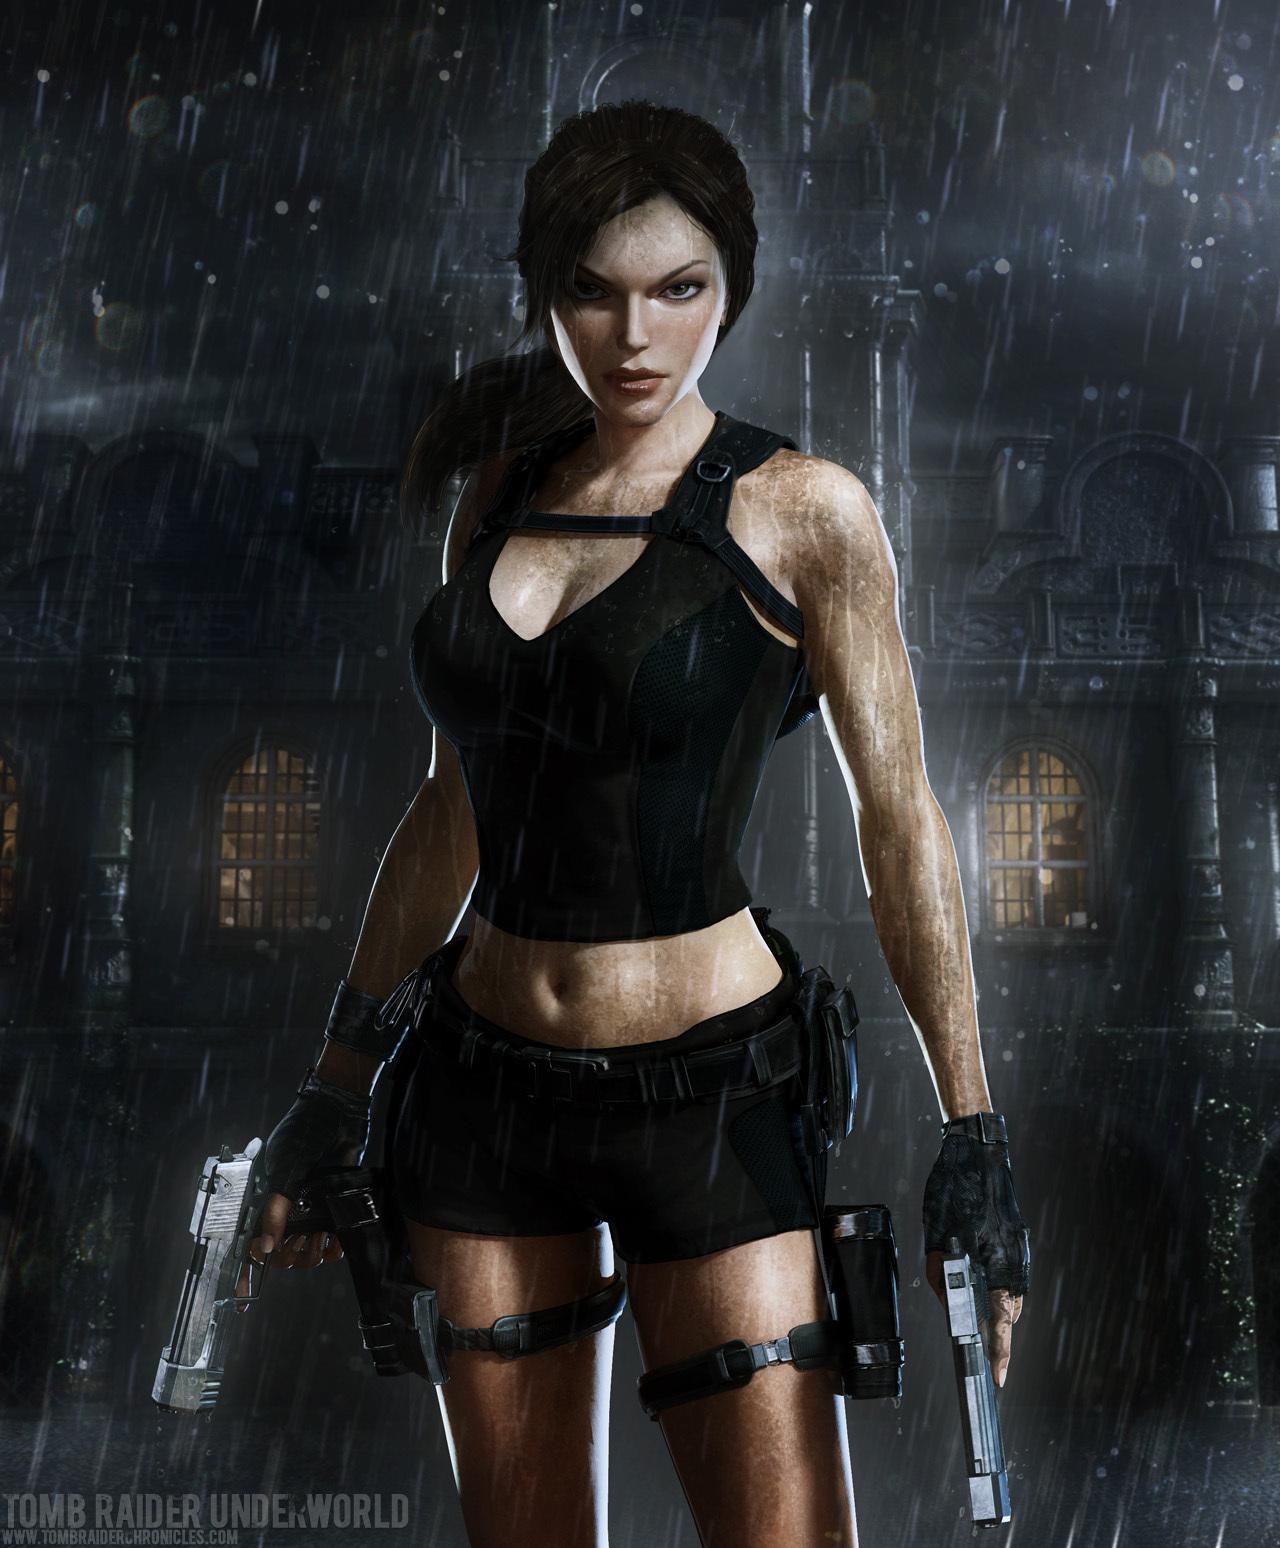 Lara croft hentai 3d